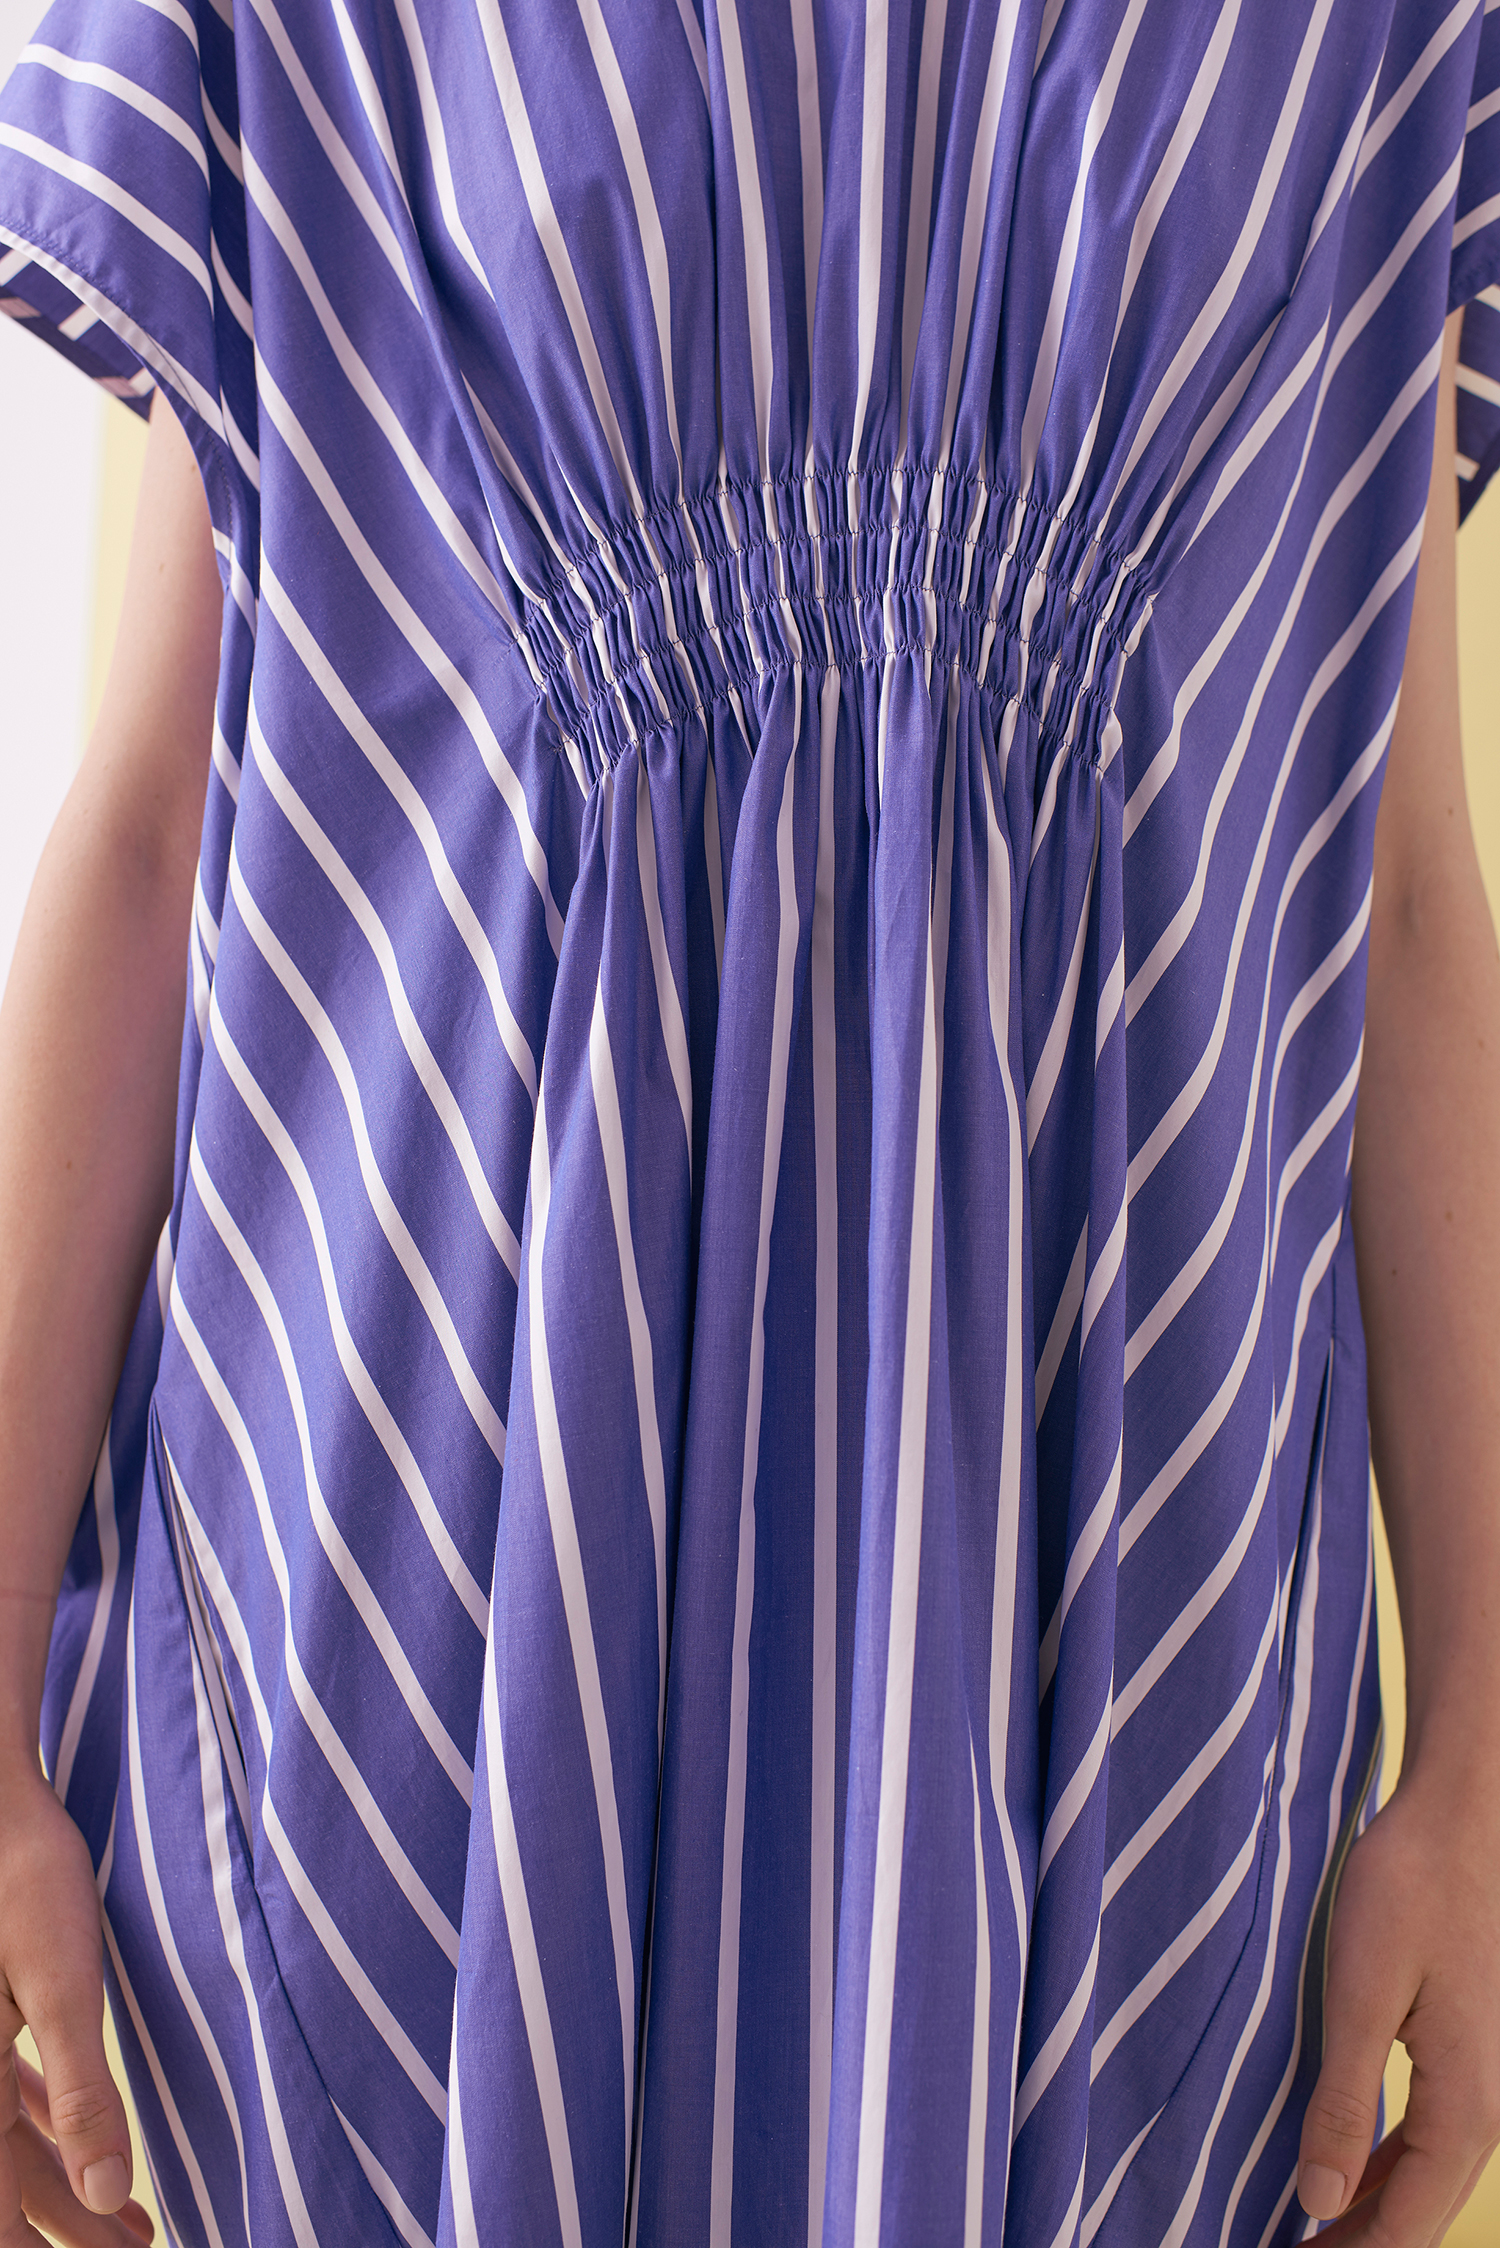 Sarah_Swann_SS17_01_Striped_Shirring_Dress_CeruleanBlue_D01.jpg